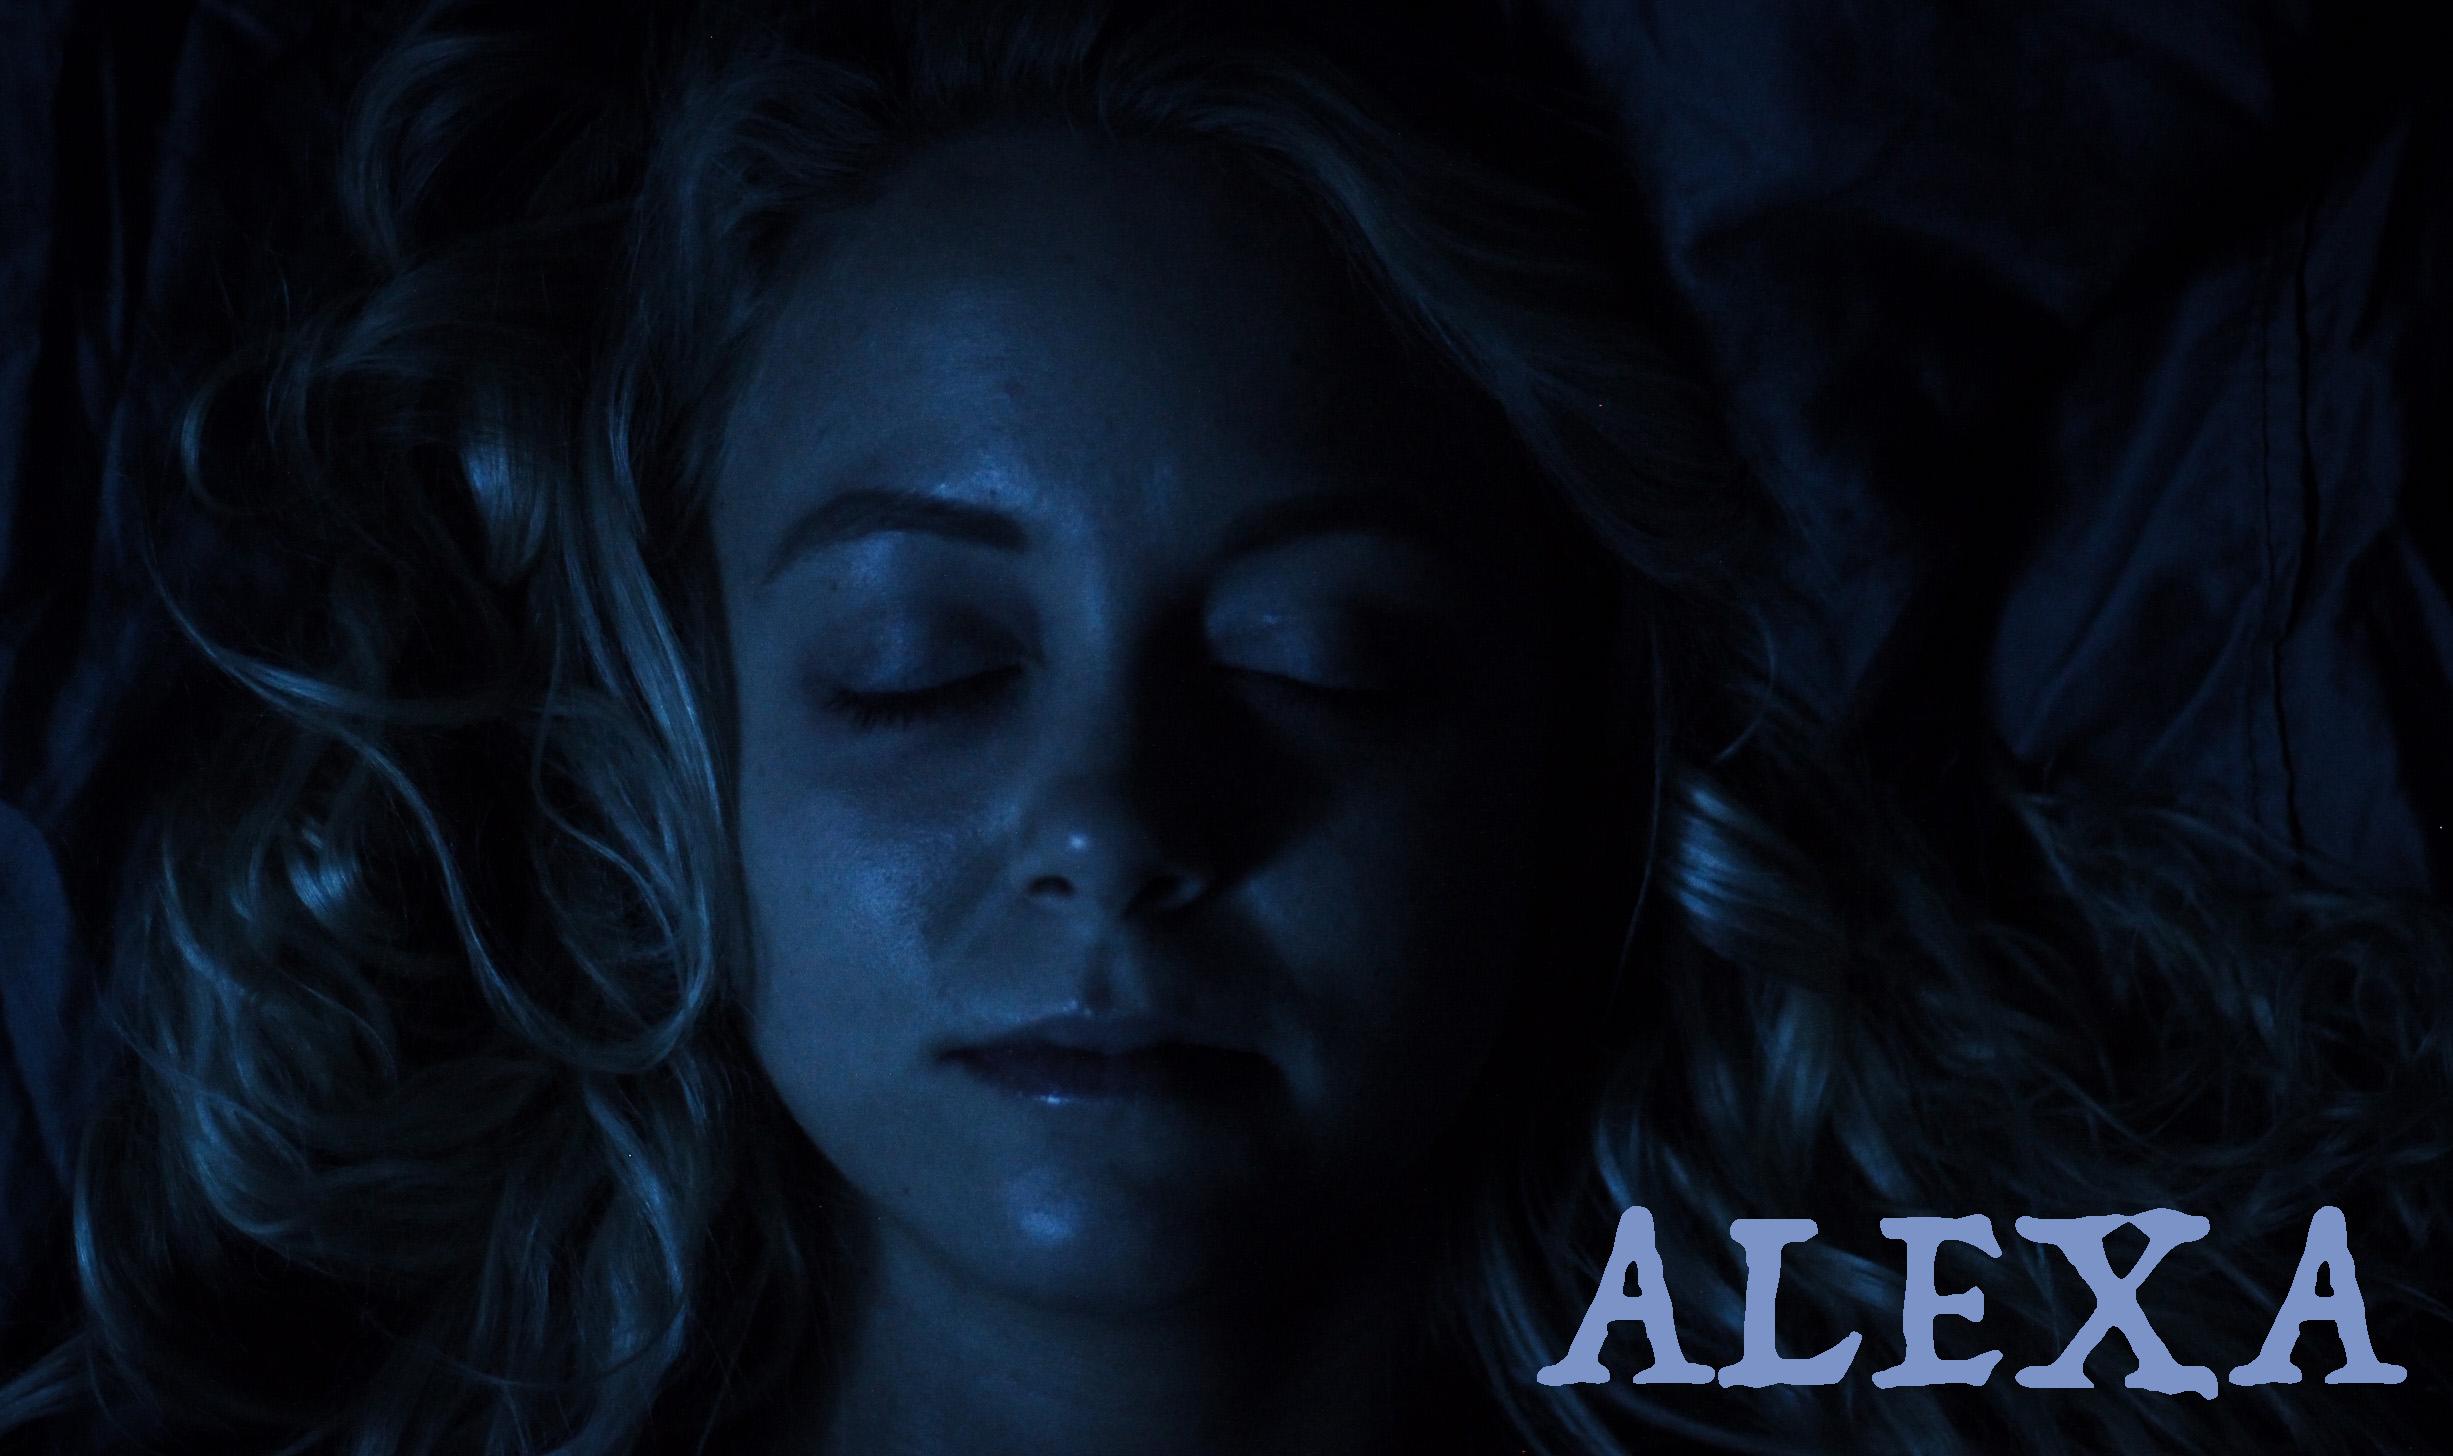 NICOLE MARTIN - Alexa Movie Poster.jpg